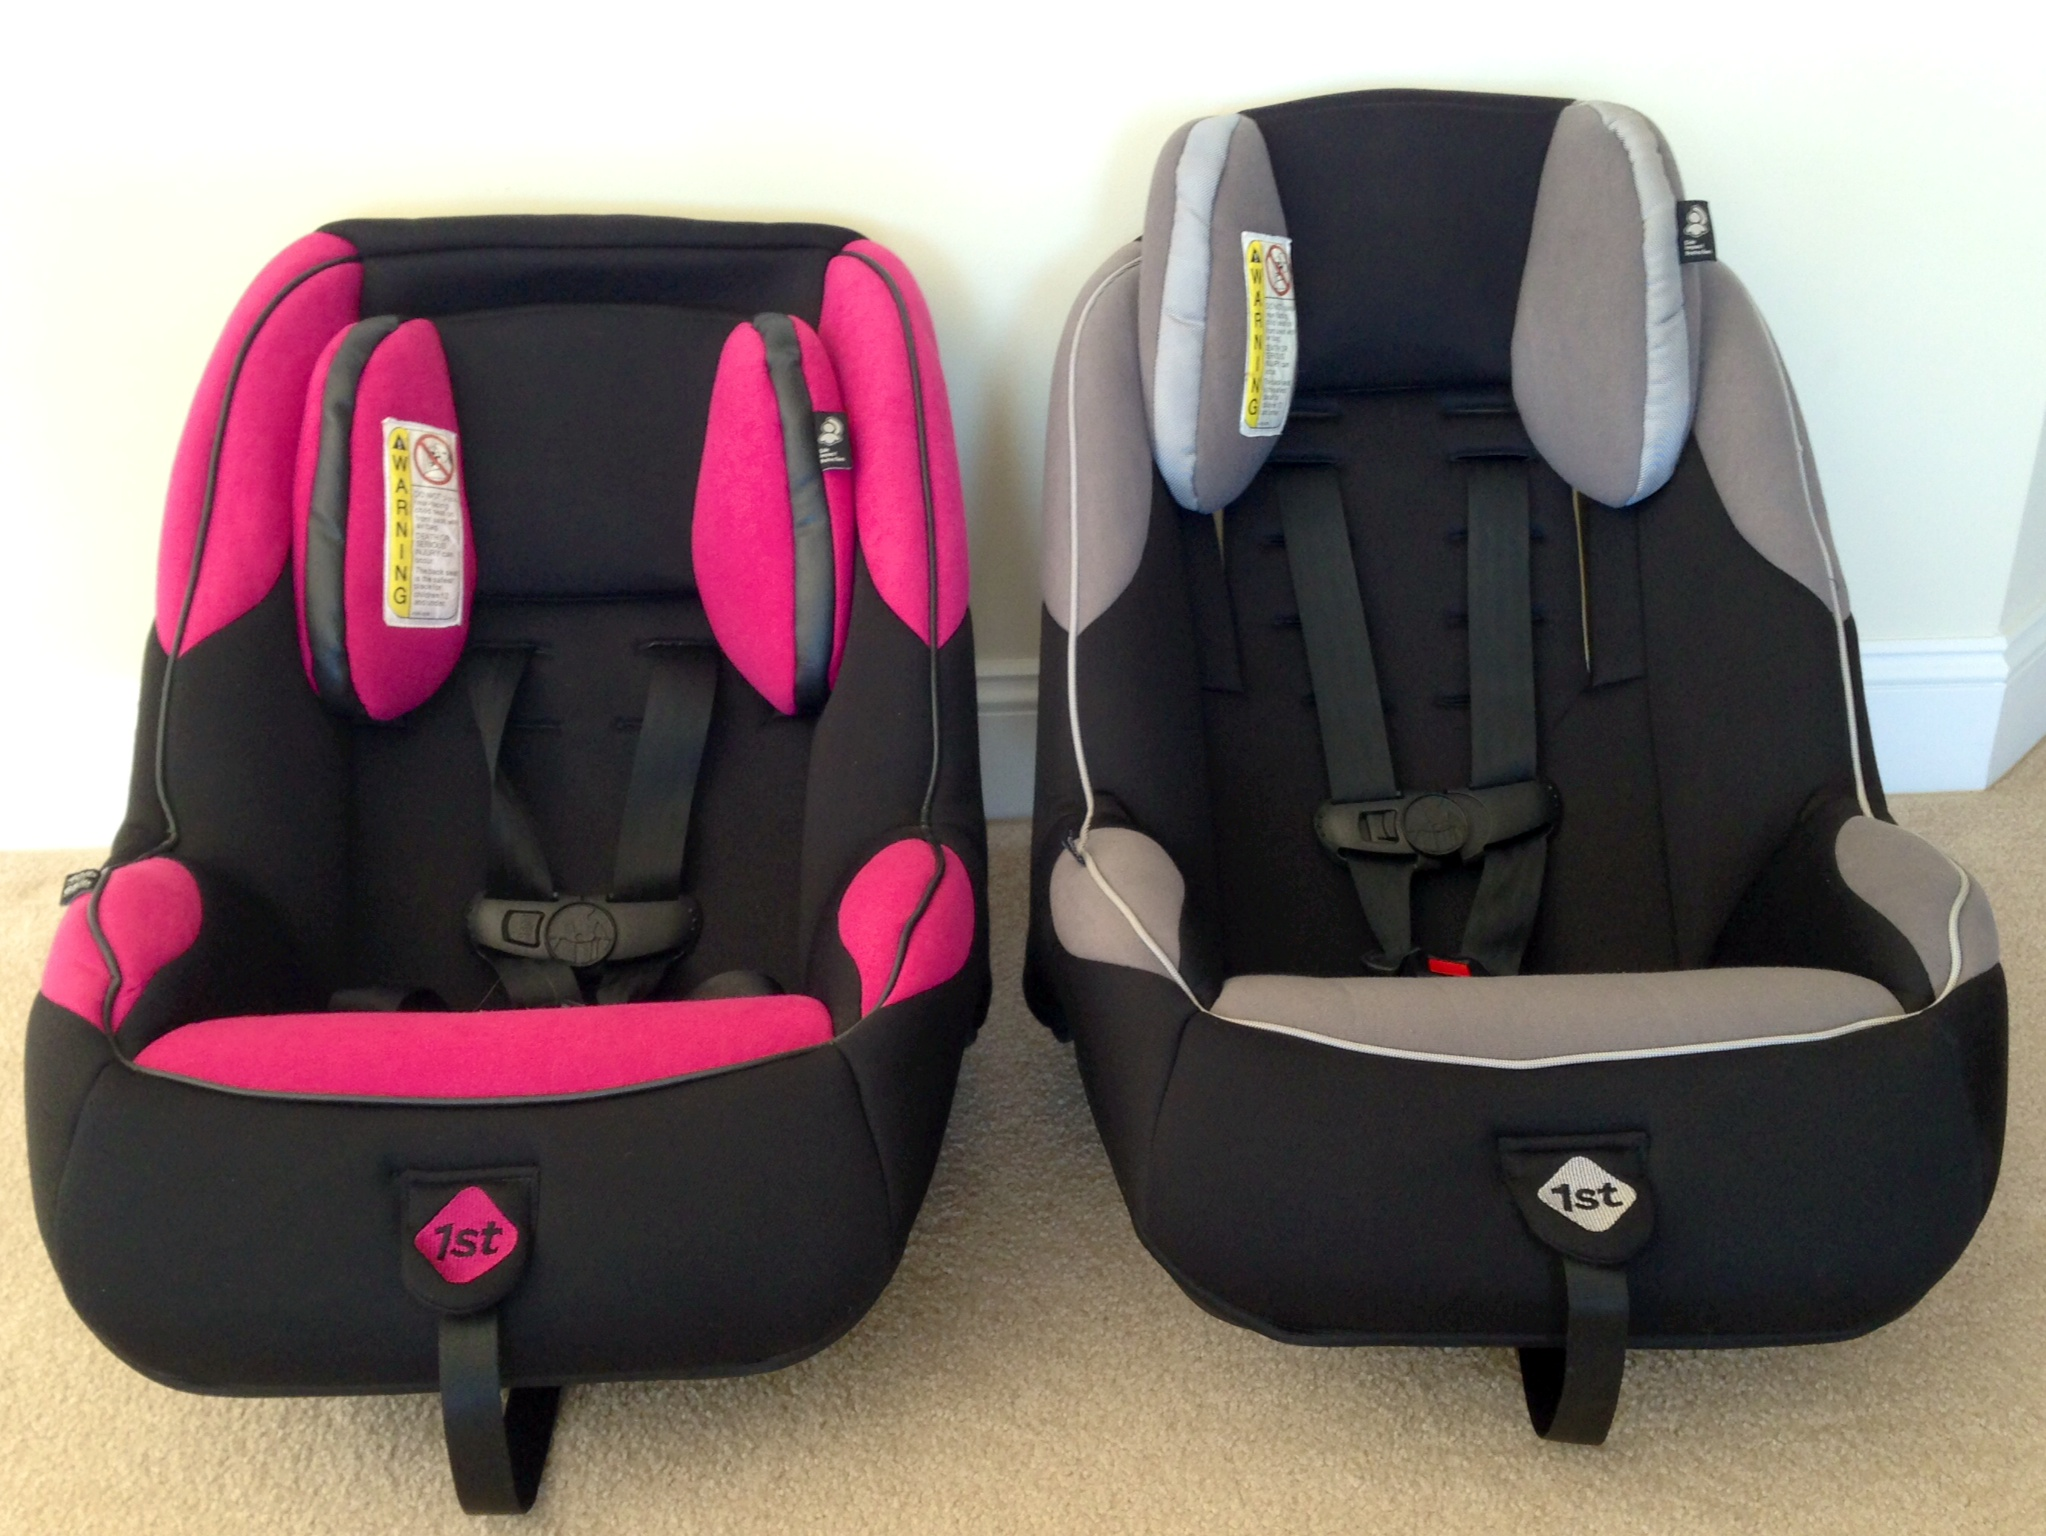 Car Seat At Vacation Comfort Rentals Hilton Head Island SC